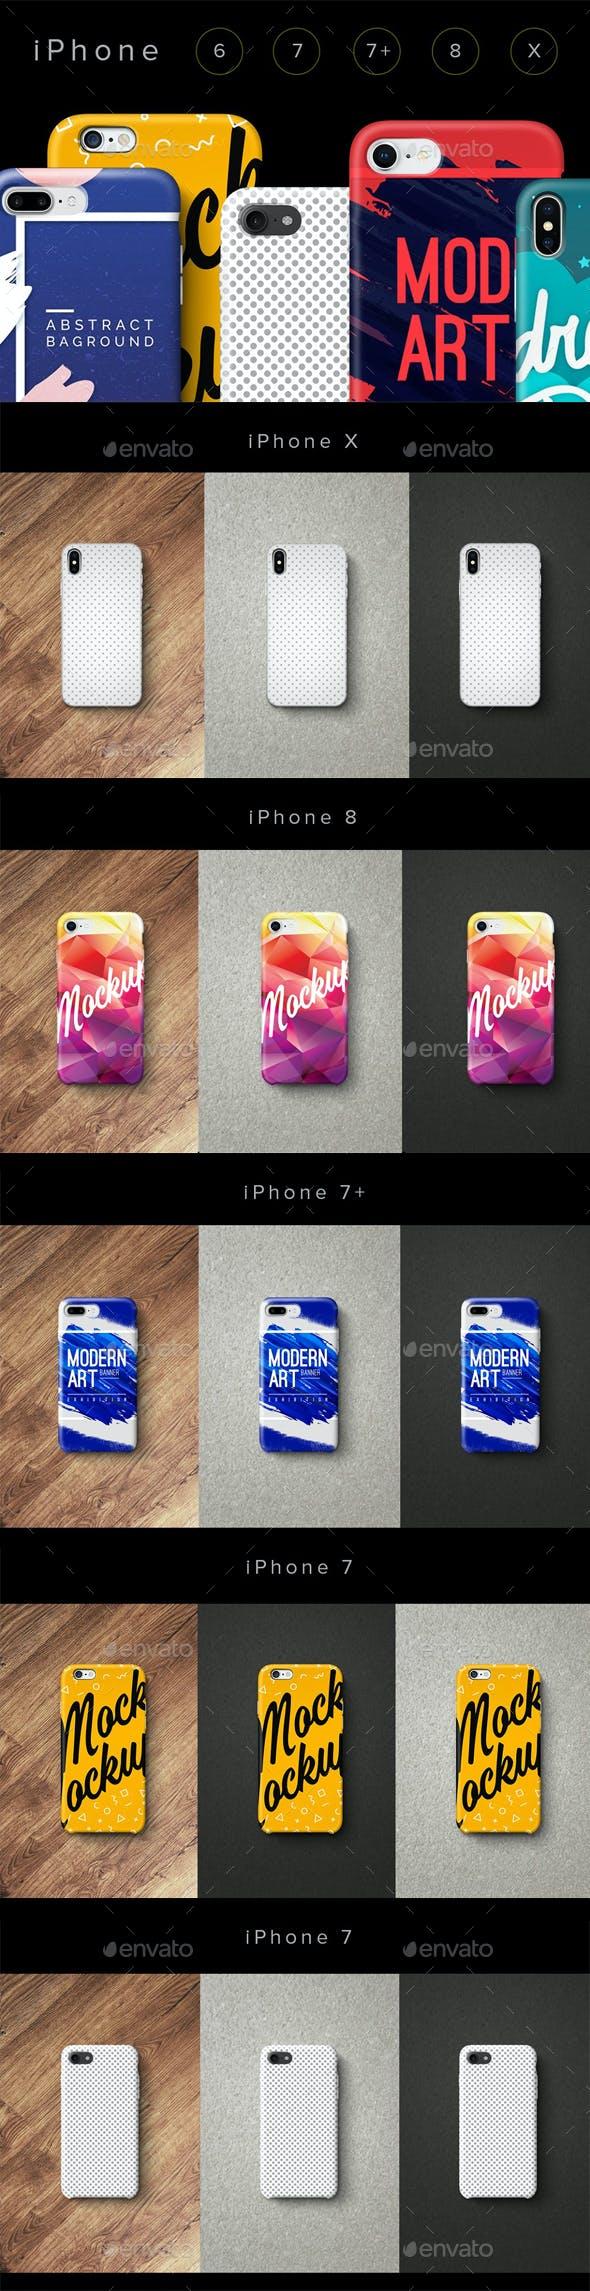 Сases Phone 6, 7, 7plus, 8, X Set